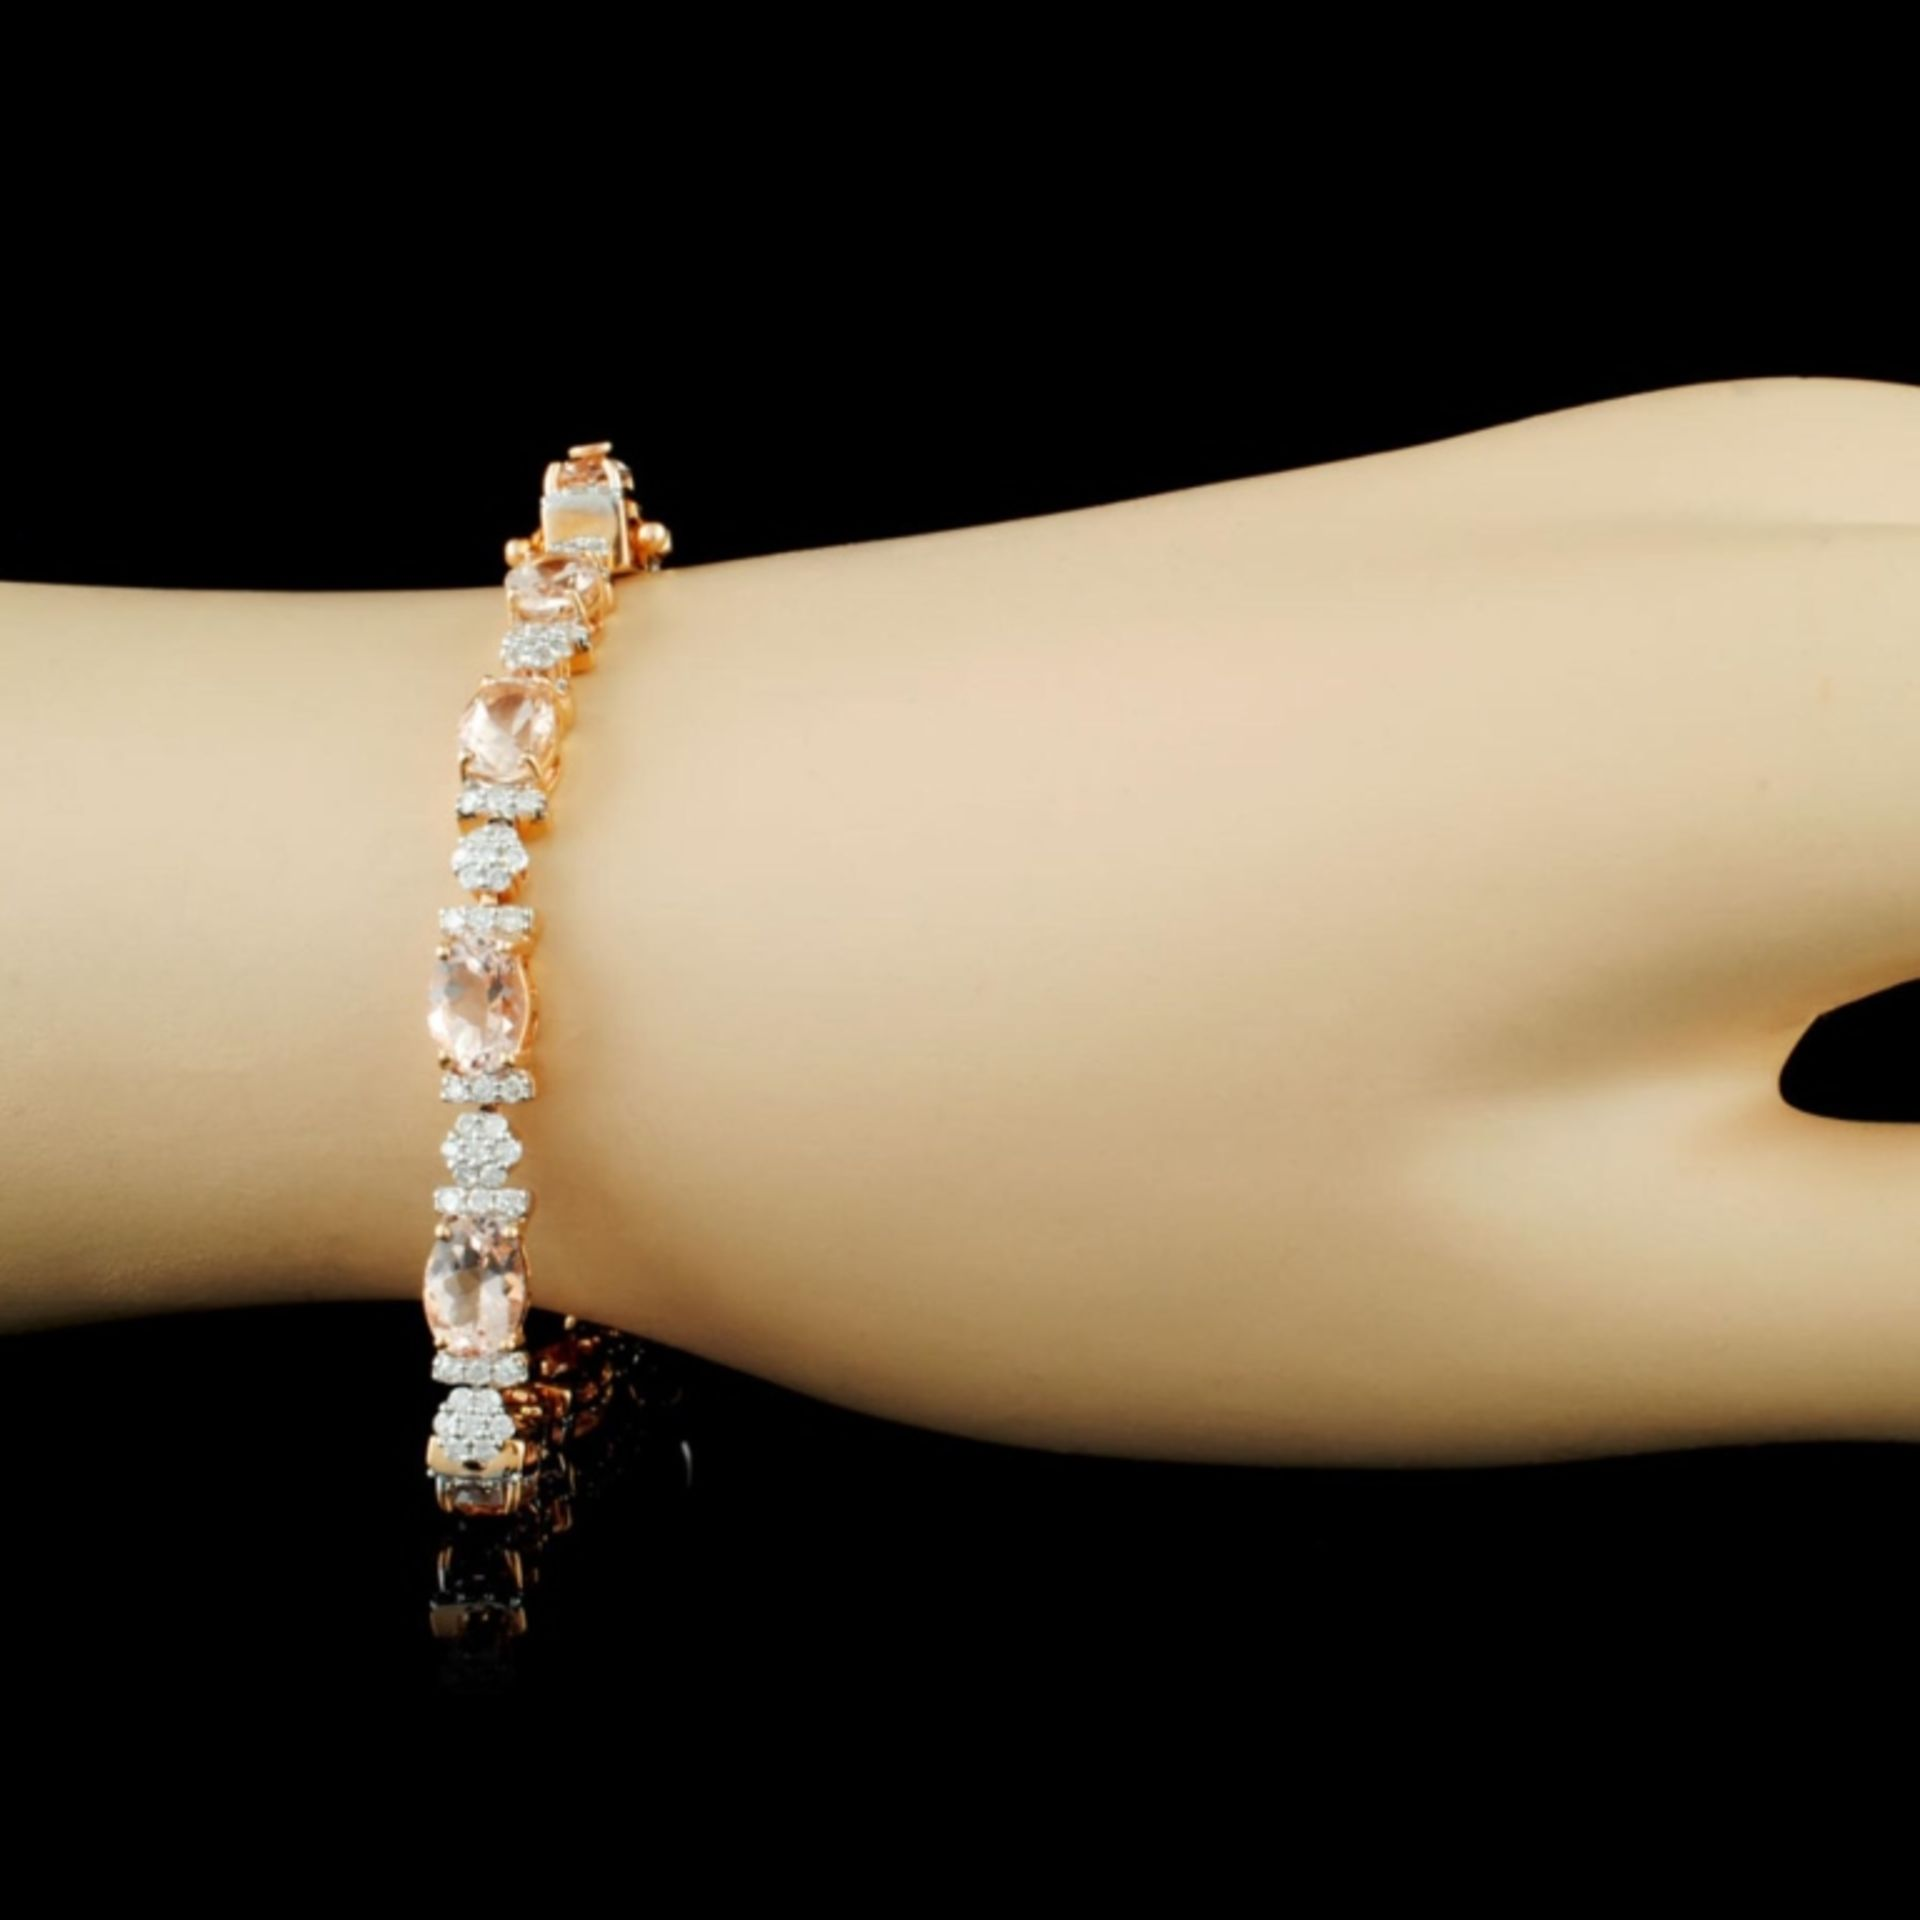 14K Gold 9.15ct Morganite & 1.50ctw Diamond Bracel - Image 3 of 4